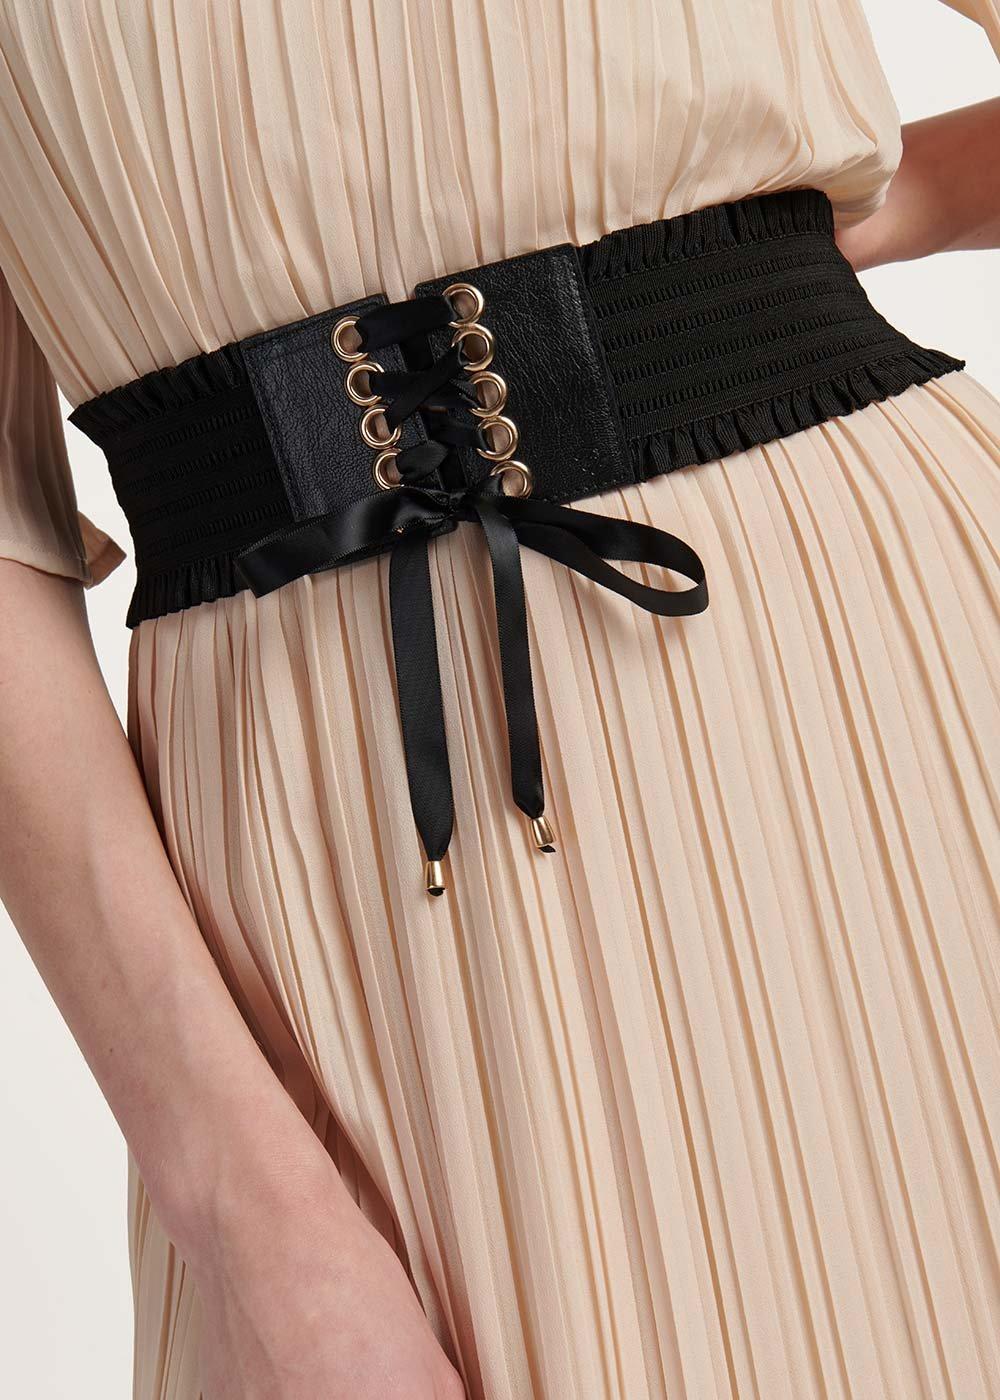 Cintura Cris modello bustino - Black - Donna